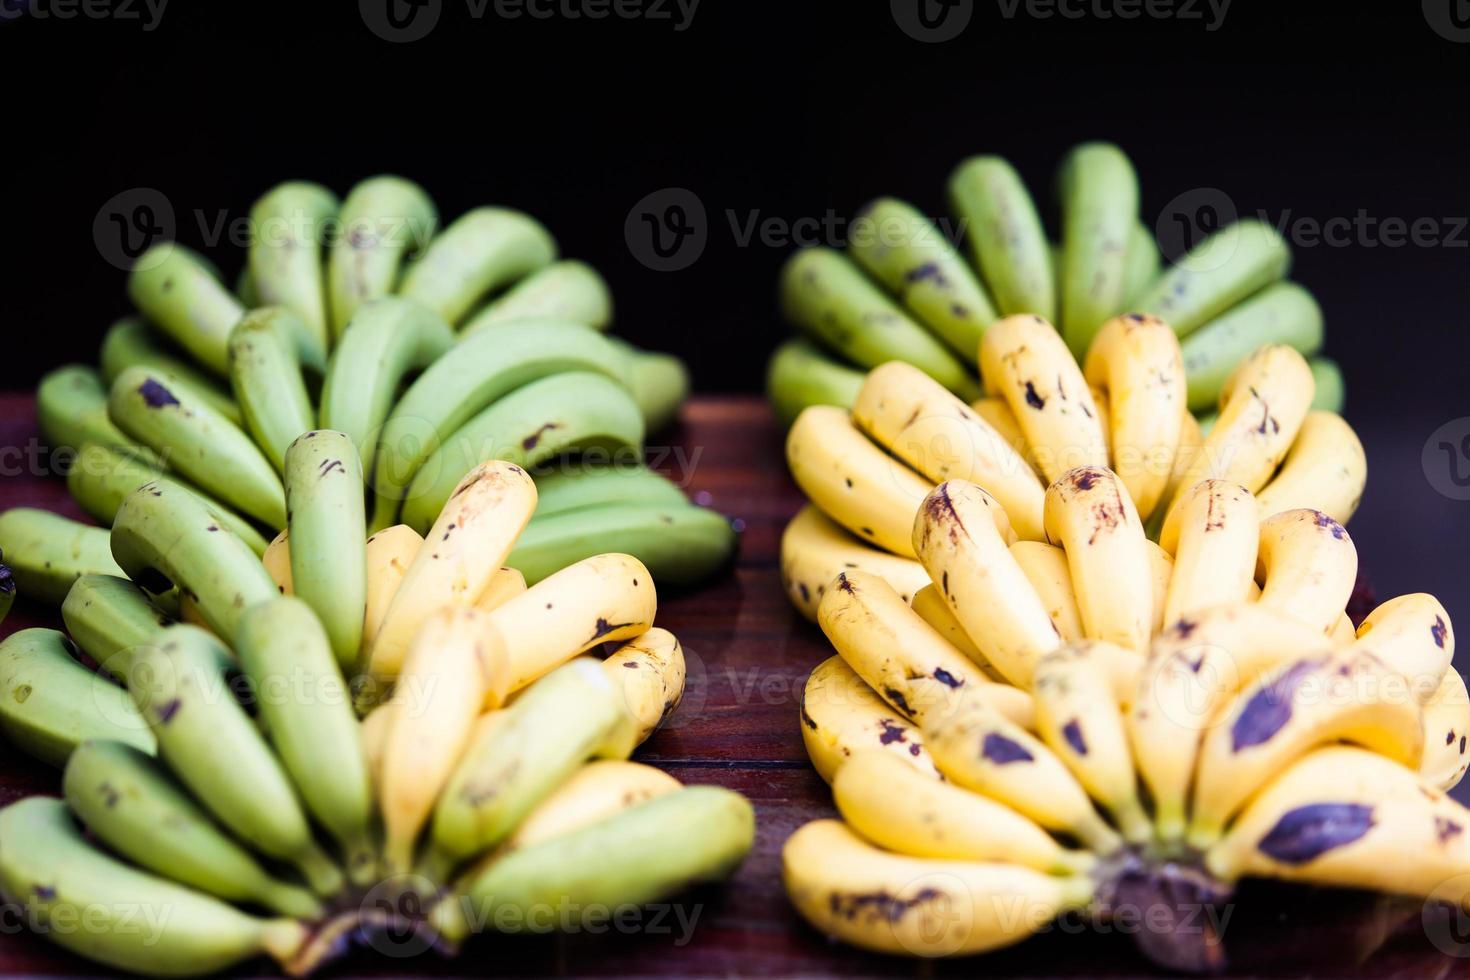 frutas de bananas verdes e amarelas no mercado foto